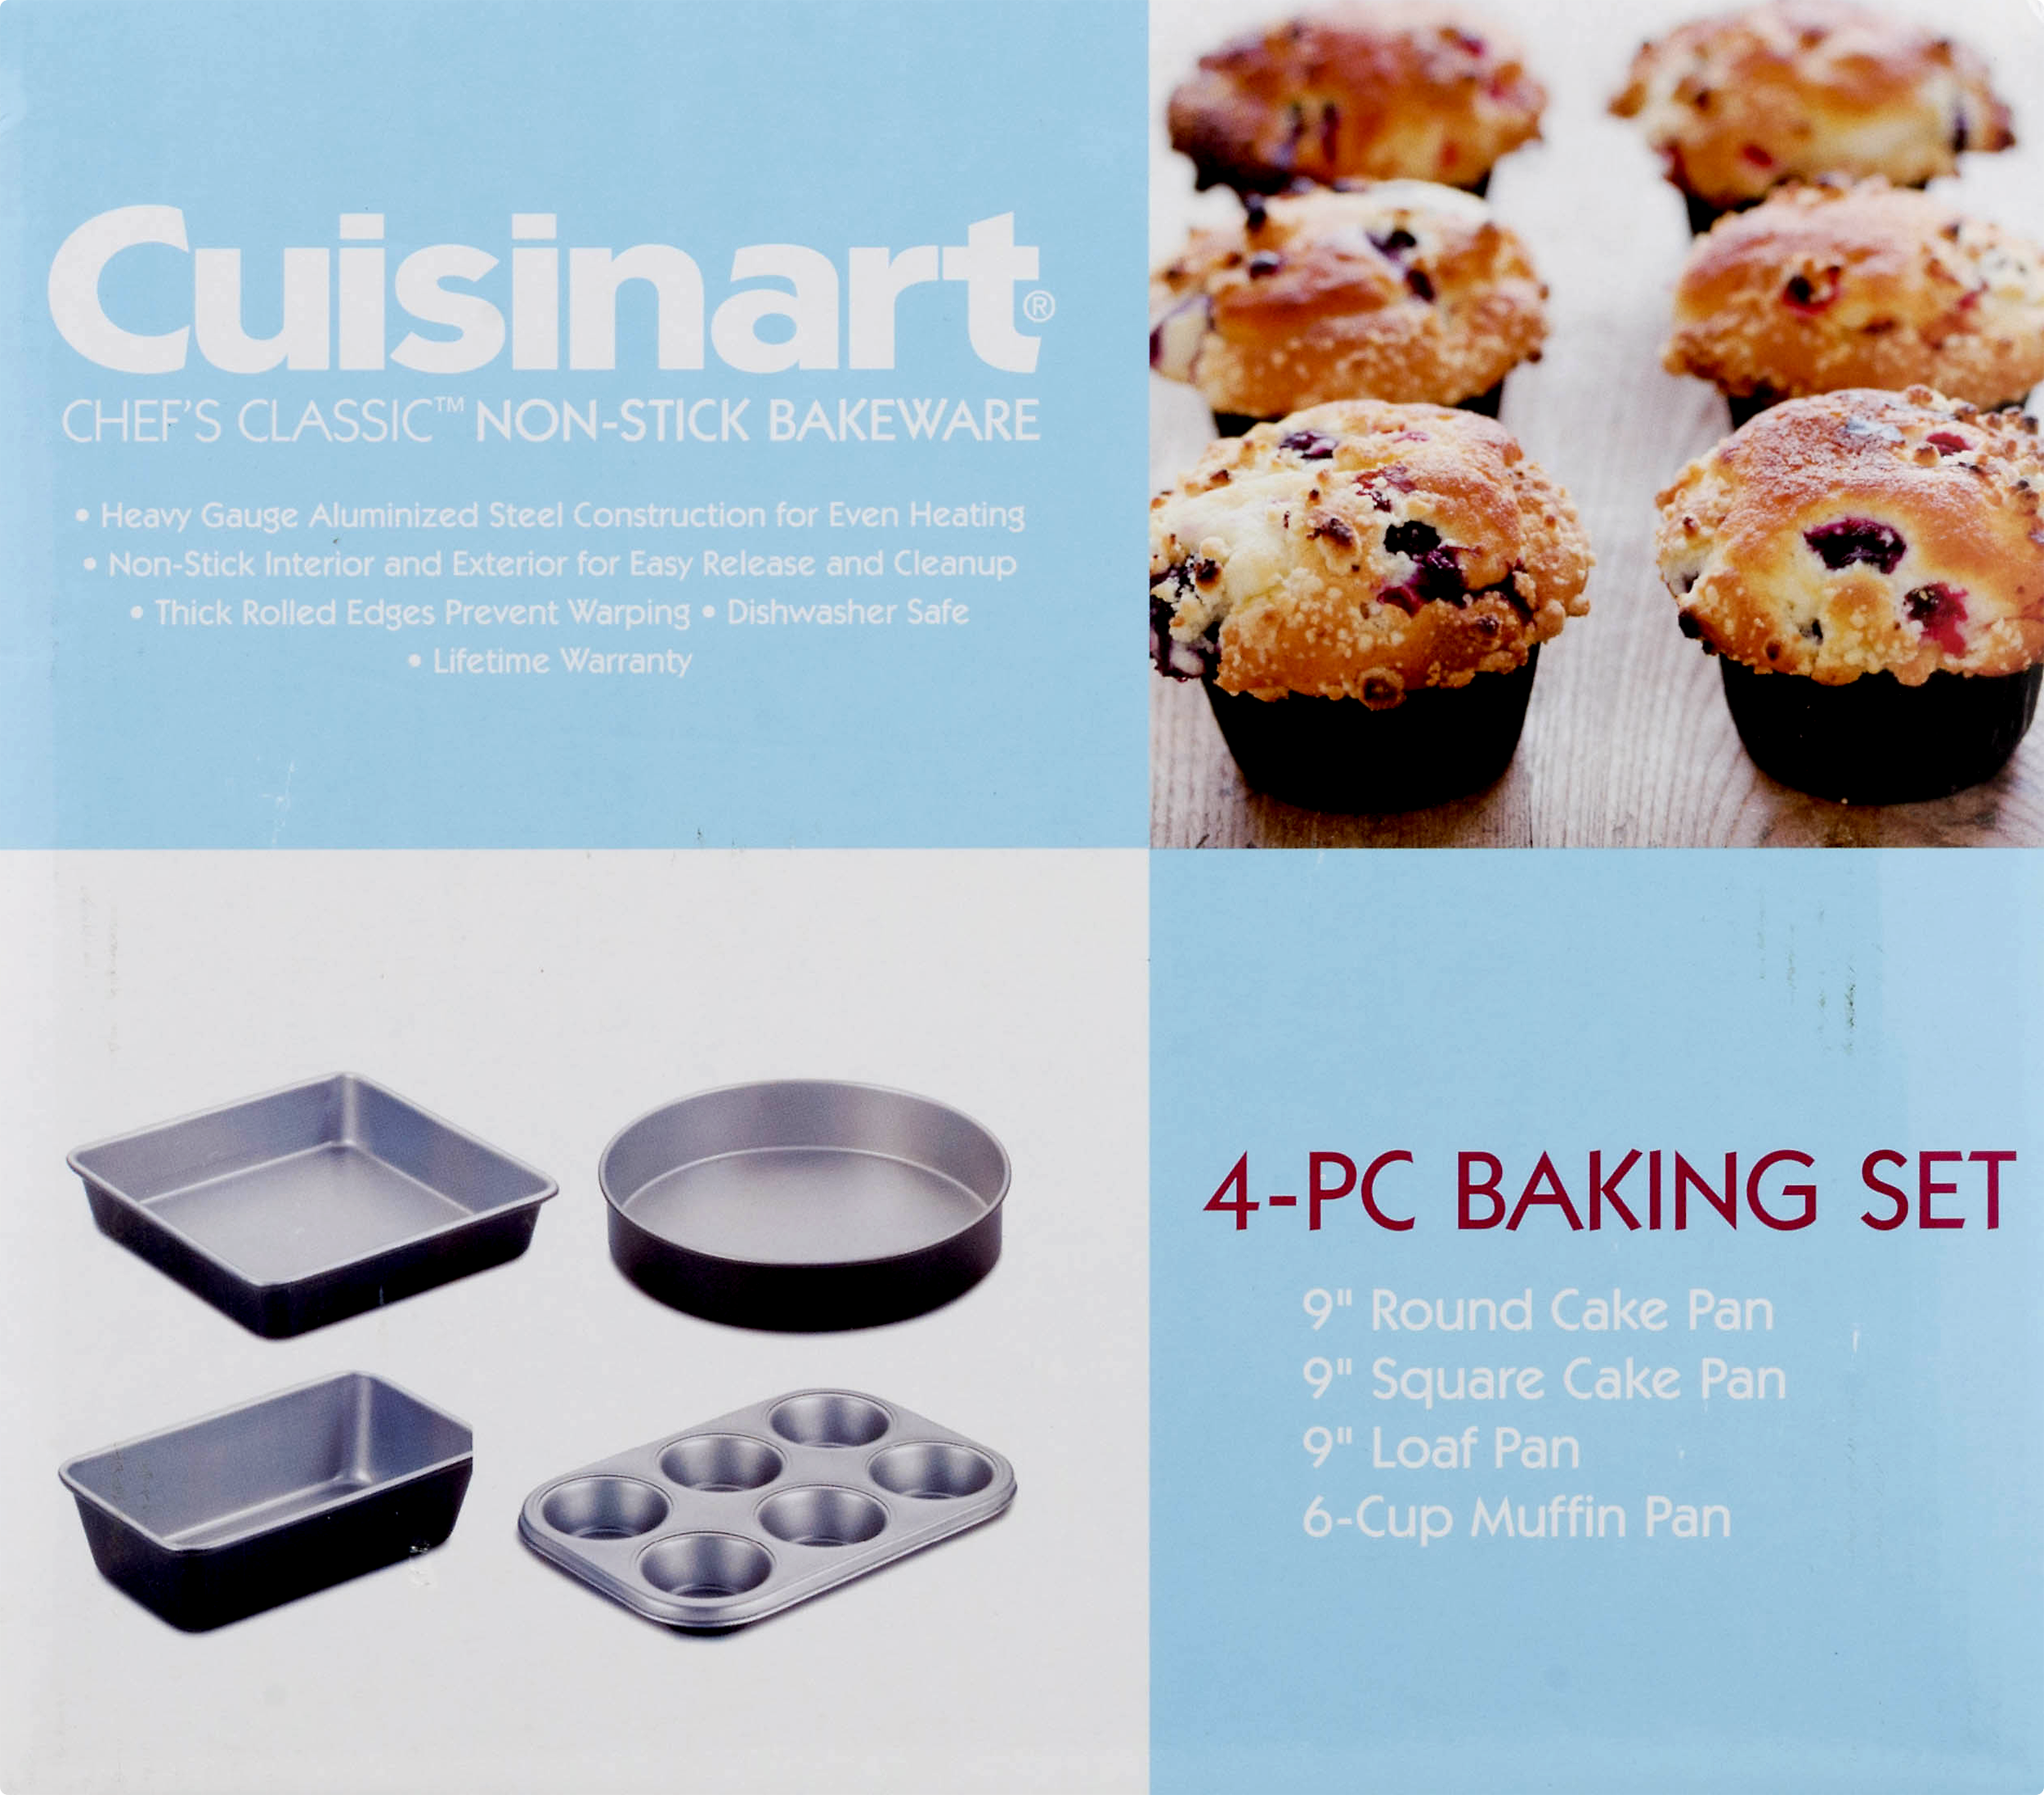 Cuisinart AMB-4 Chefs Classic Nonstick Bakeware 4-Piece Starter Set